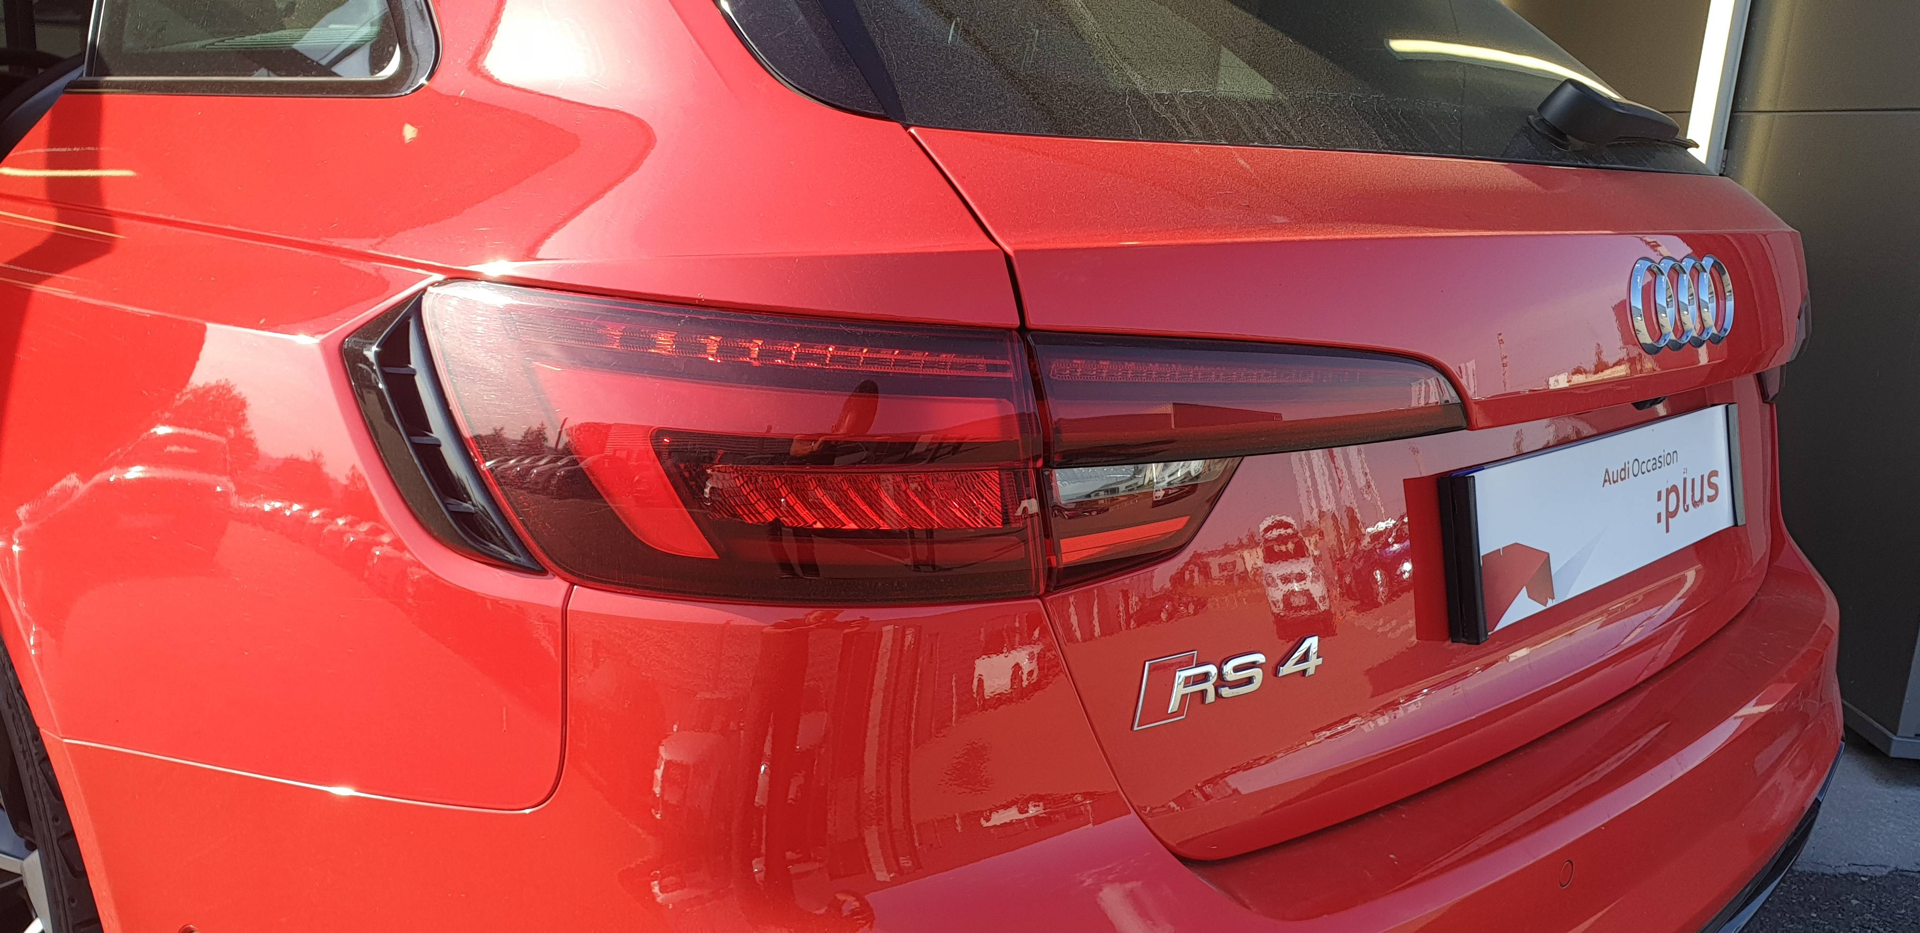 7 - RS4 Avant V6 2.9 TFSI 450 ch Tiptronic 8